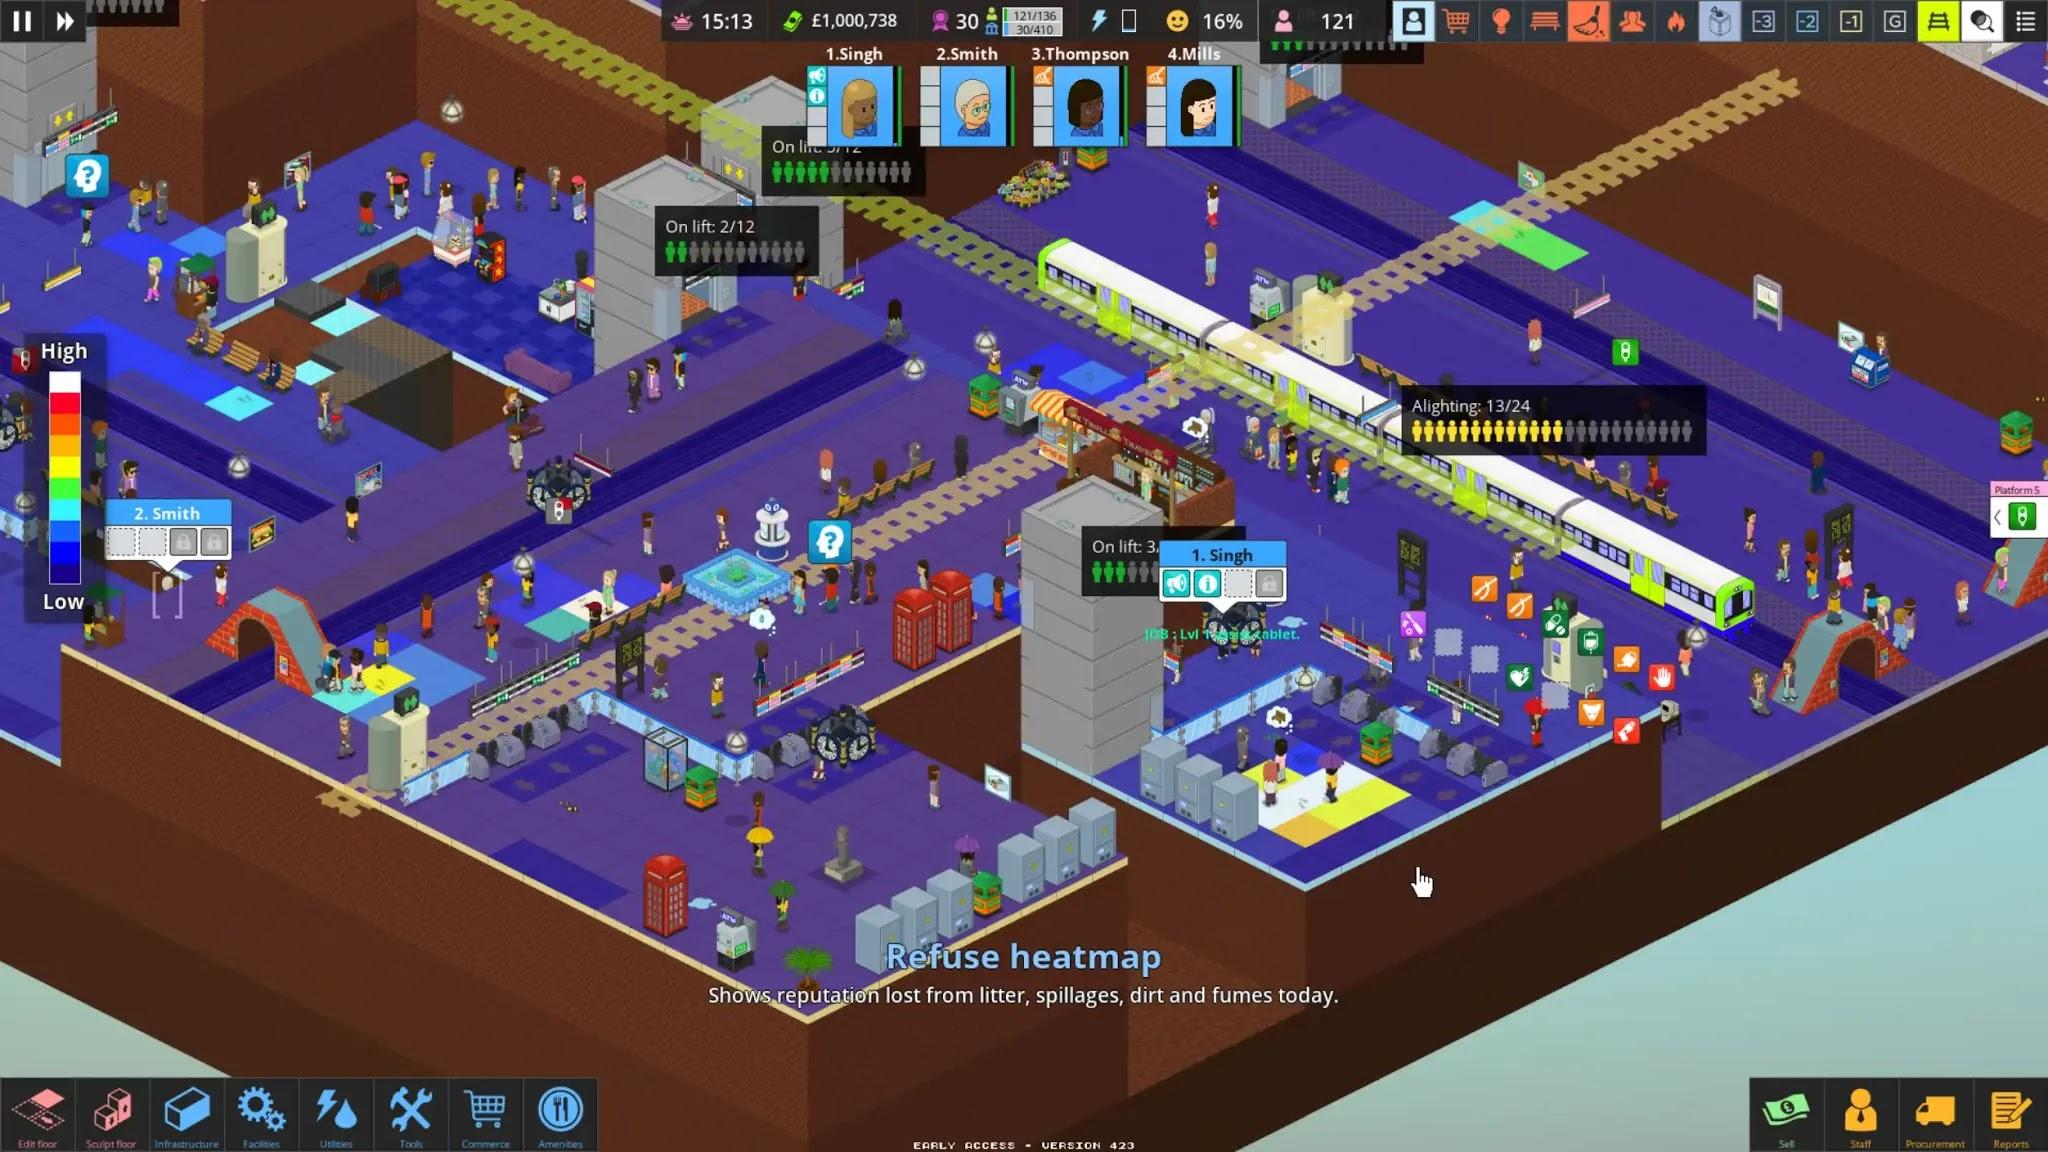 Overcrowd Refuse Heatmap